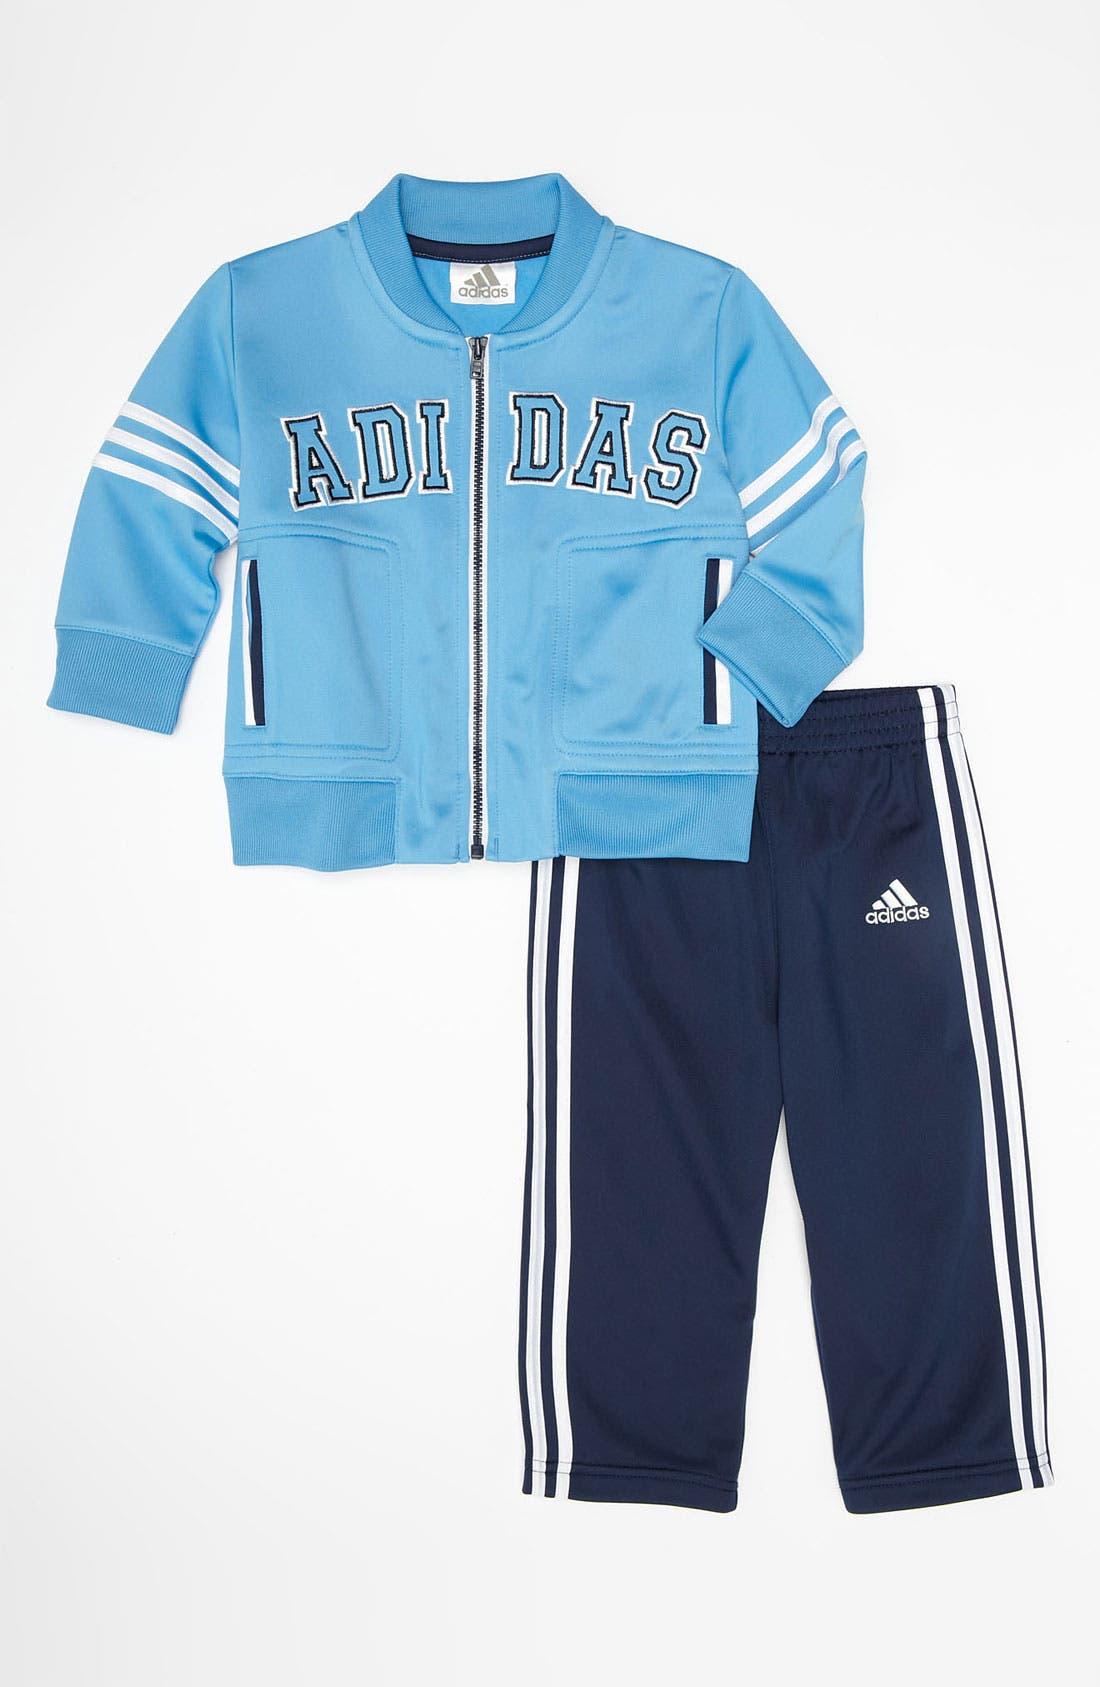 Alternate Image 1 Selected - adidas 'Team' Jacket & Pants (Infant)